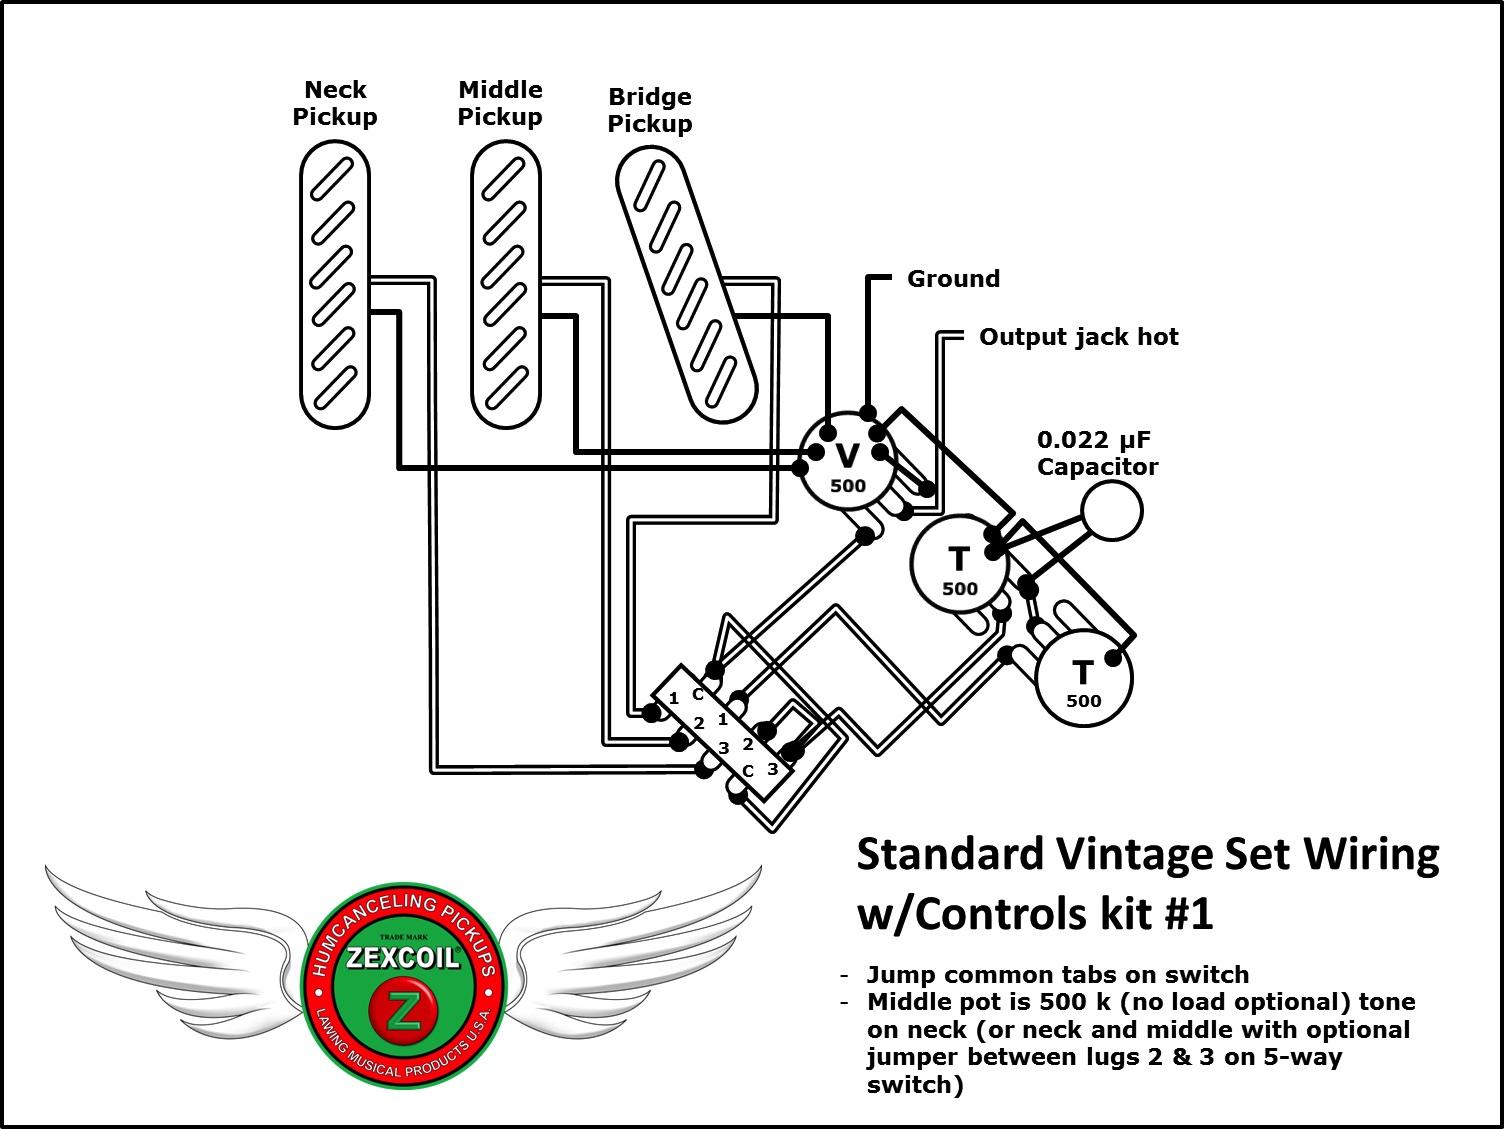 Controls Kit #1